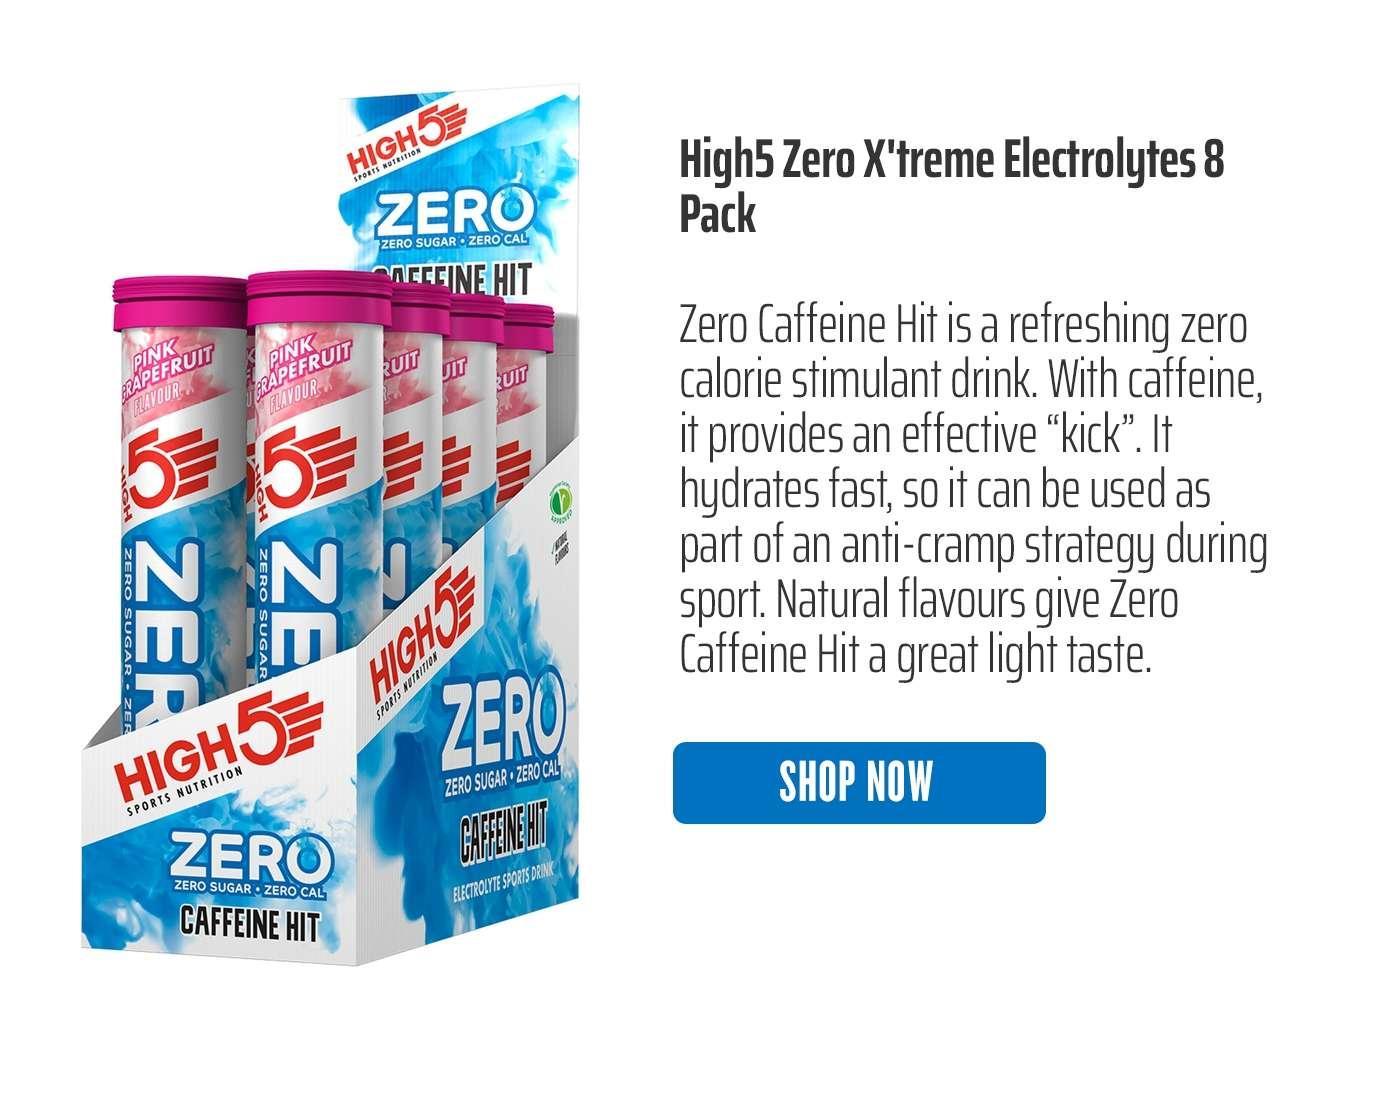 High5 Zero X'treme Electrolytes 8 Pack